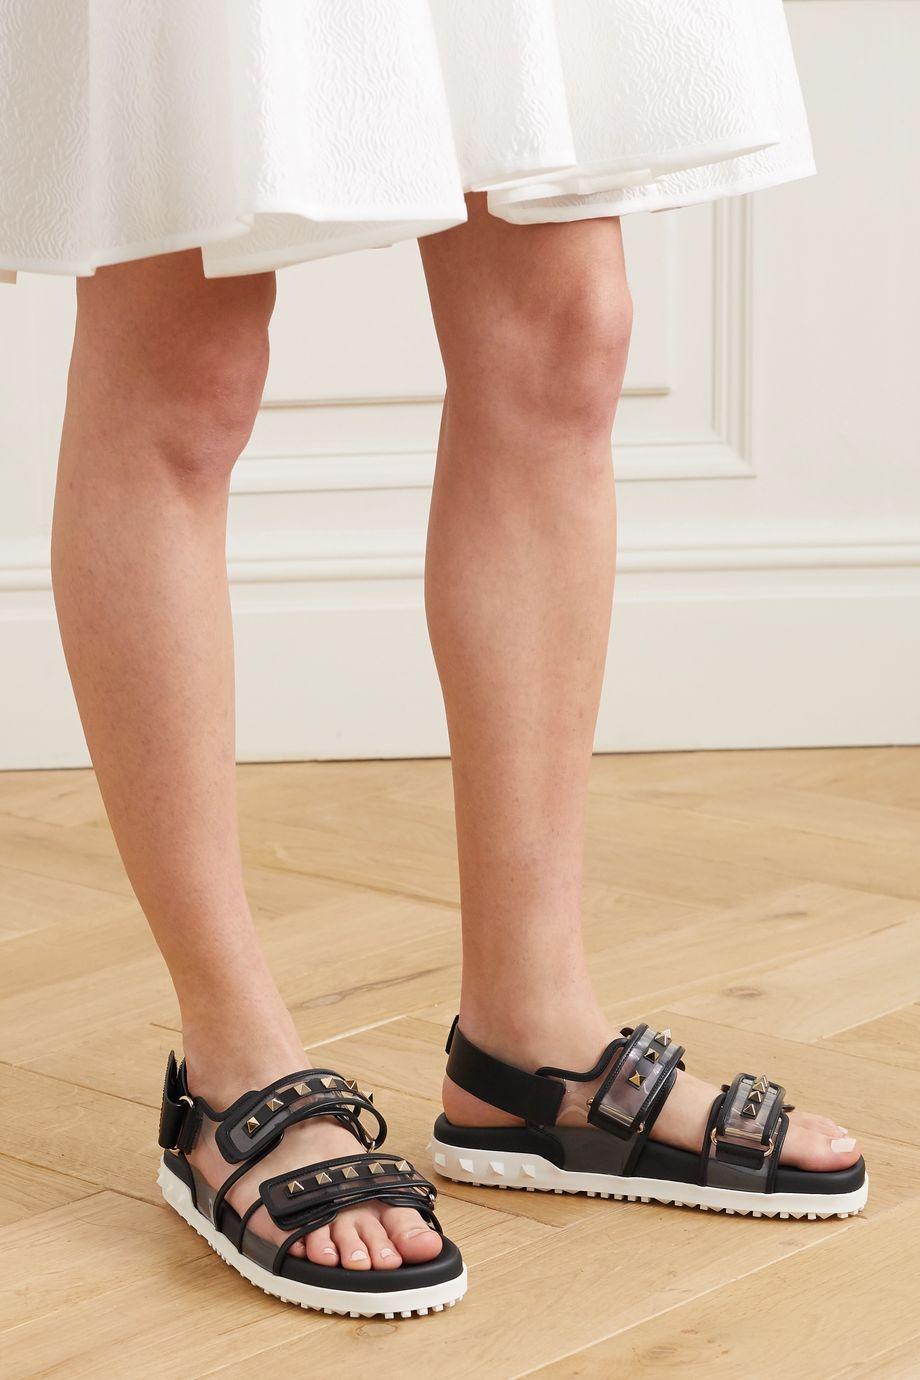 Valentino Valentino Garavani Rockstud leather and PVC sandals